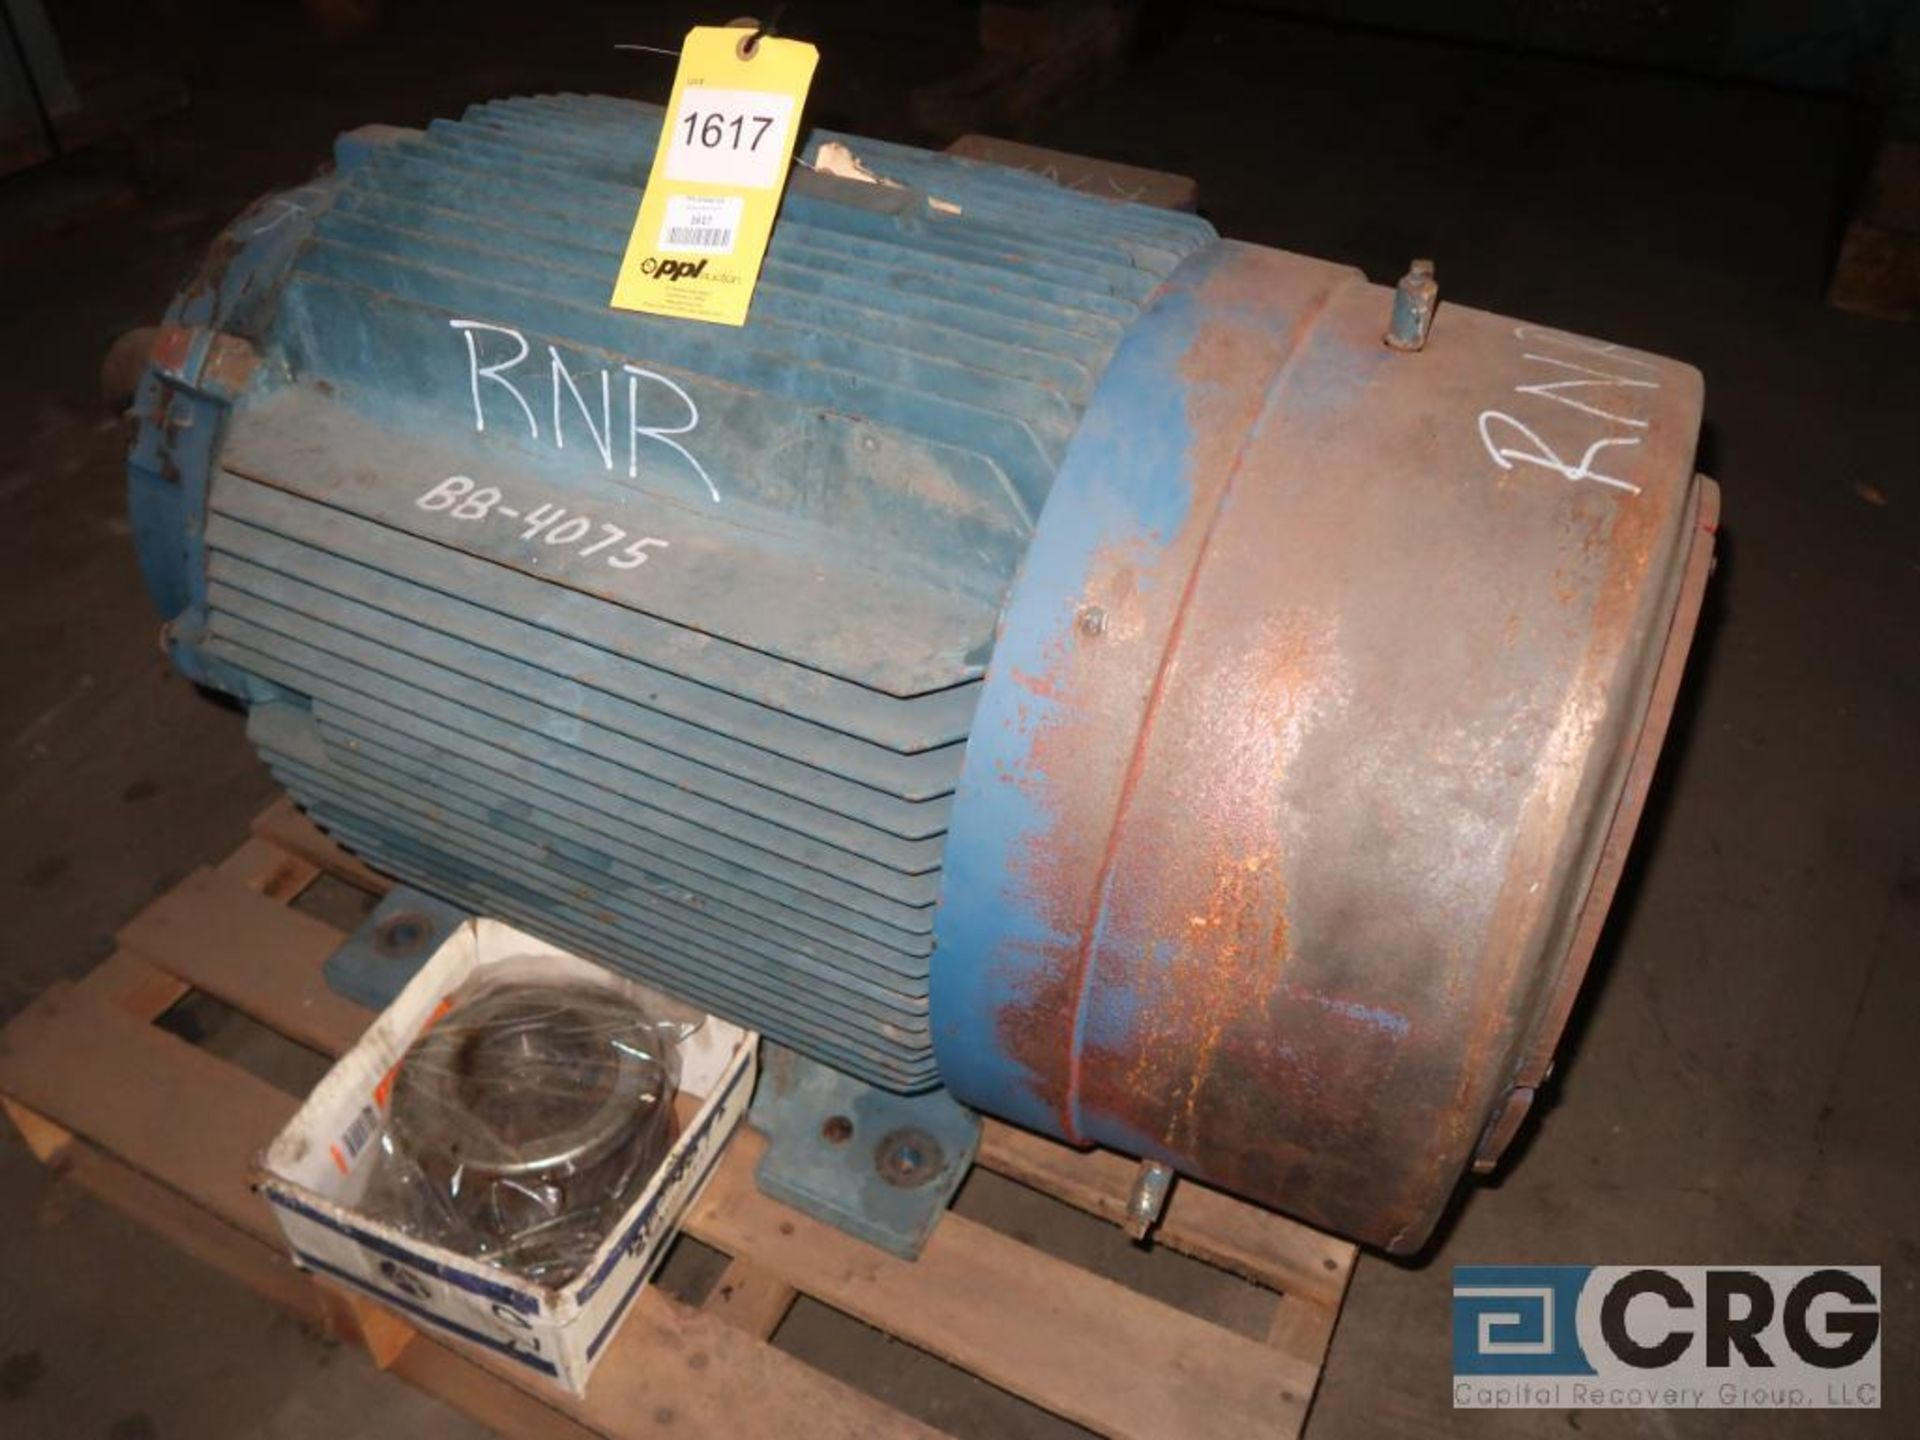 Siemens 125 HP motor, 460 volt, 3 ph., 1,185 RPM, frame 445T (Off Site Warehouse)